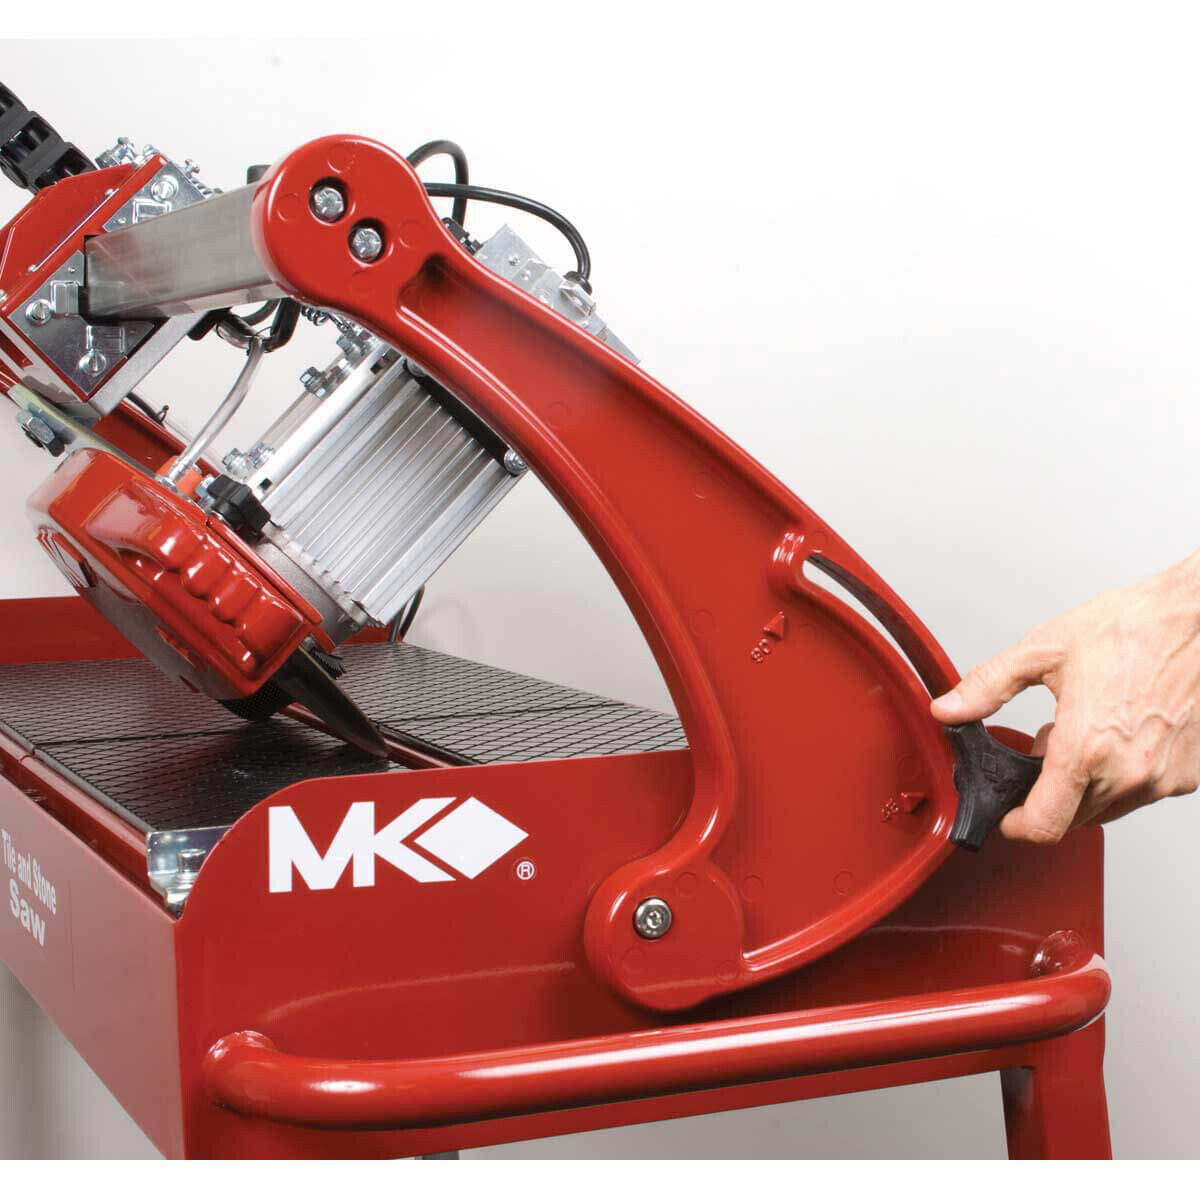 MK 212 Wet Stone Rail Saw Miter Lock